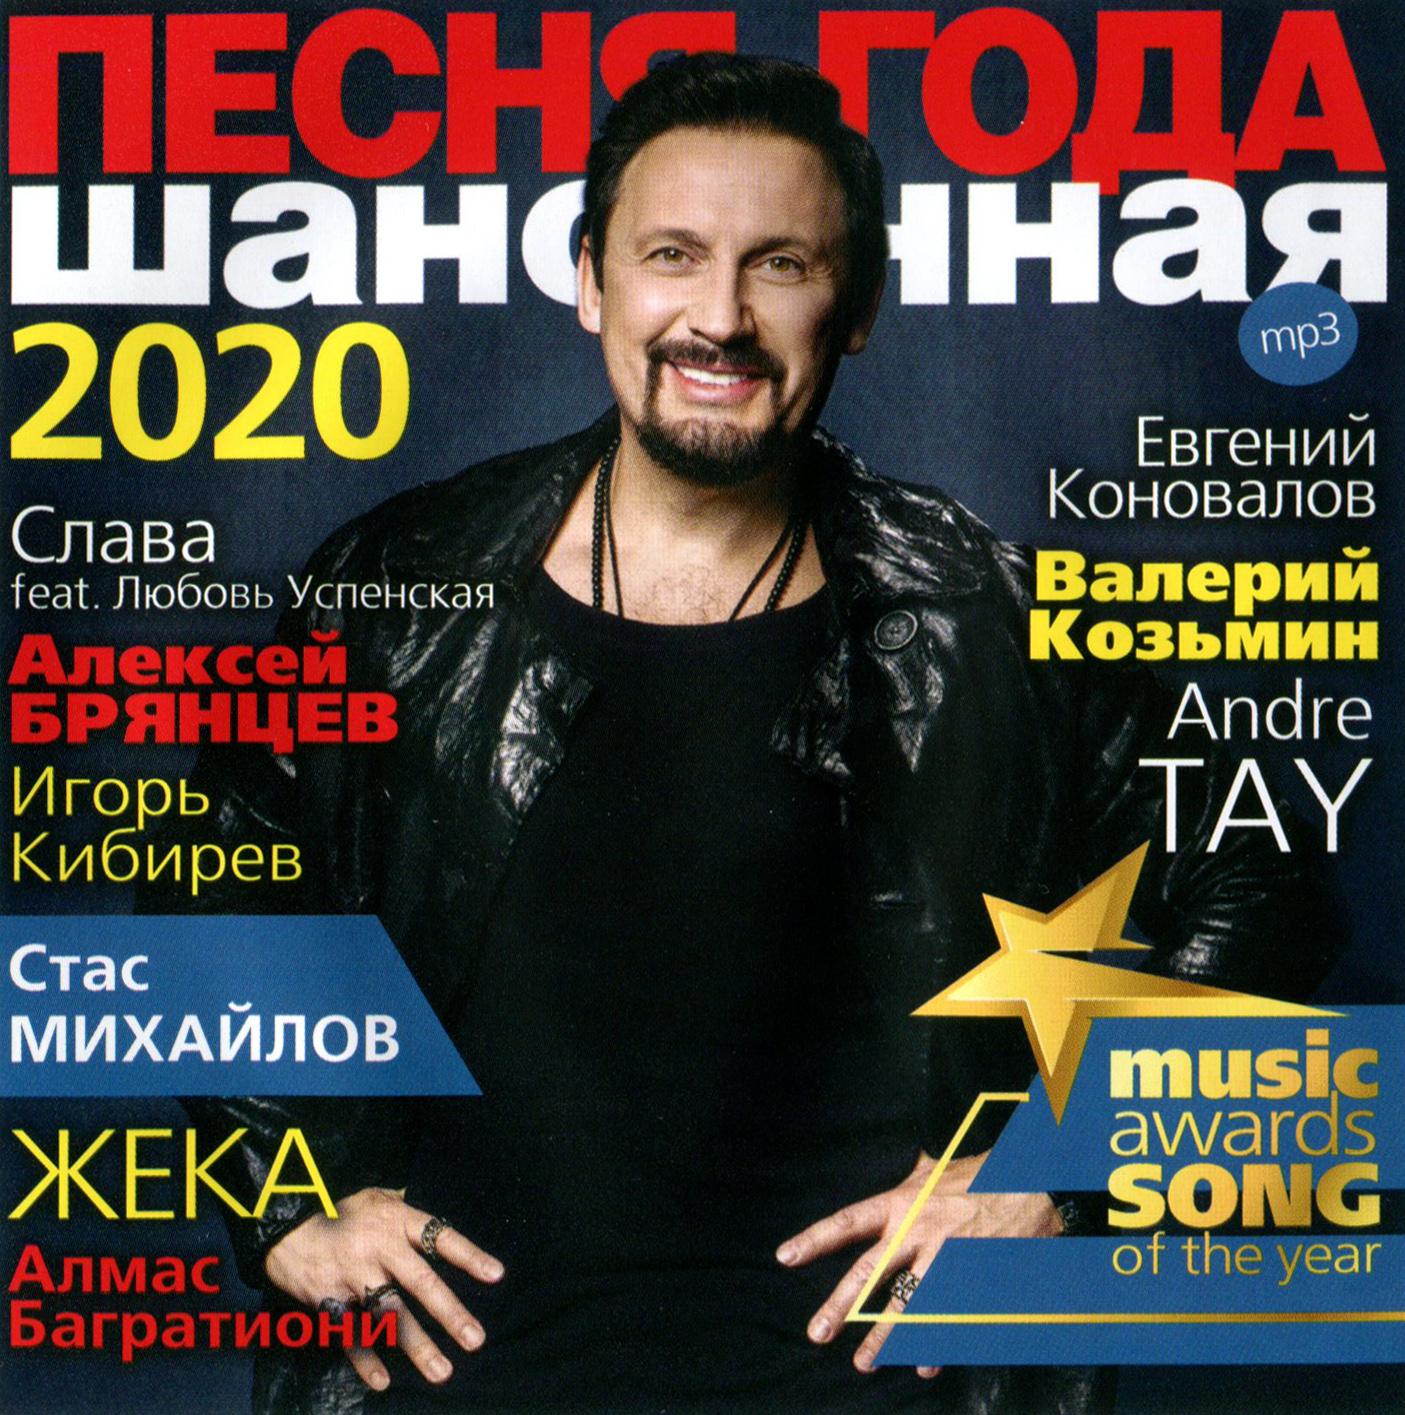 ПЕСНЯ ГОДА - 2020 шансонная [mp3]